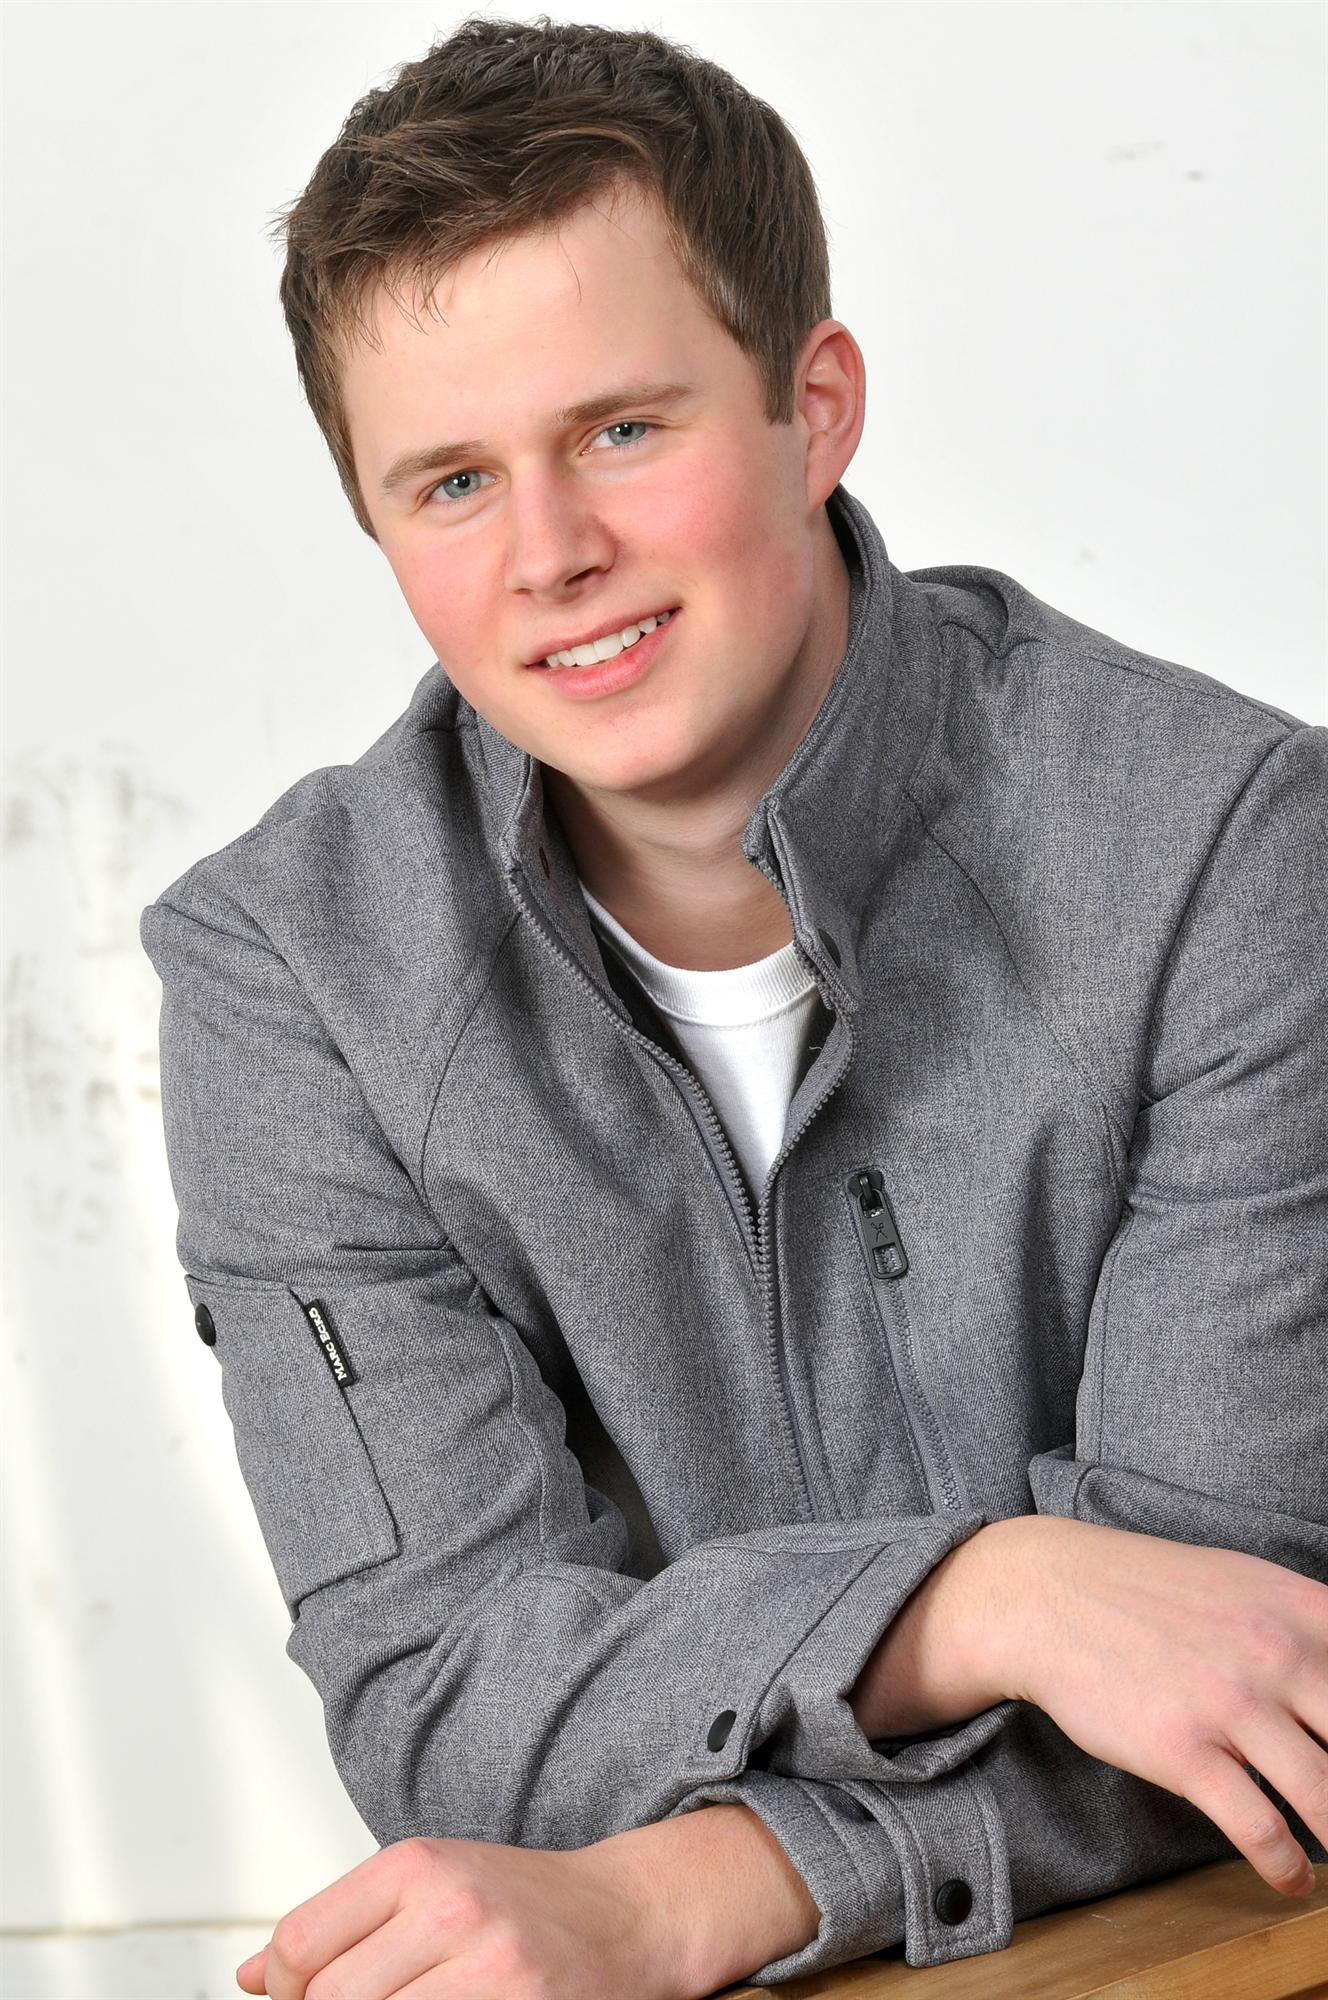 Caleb Pritchard